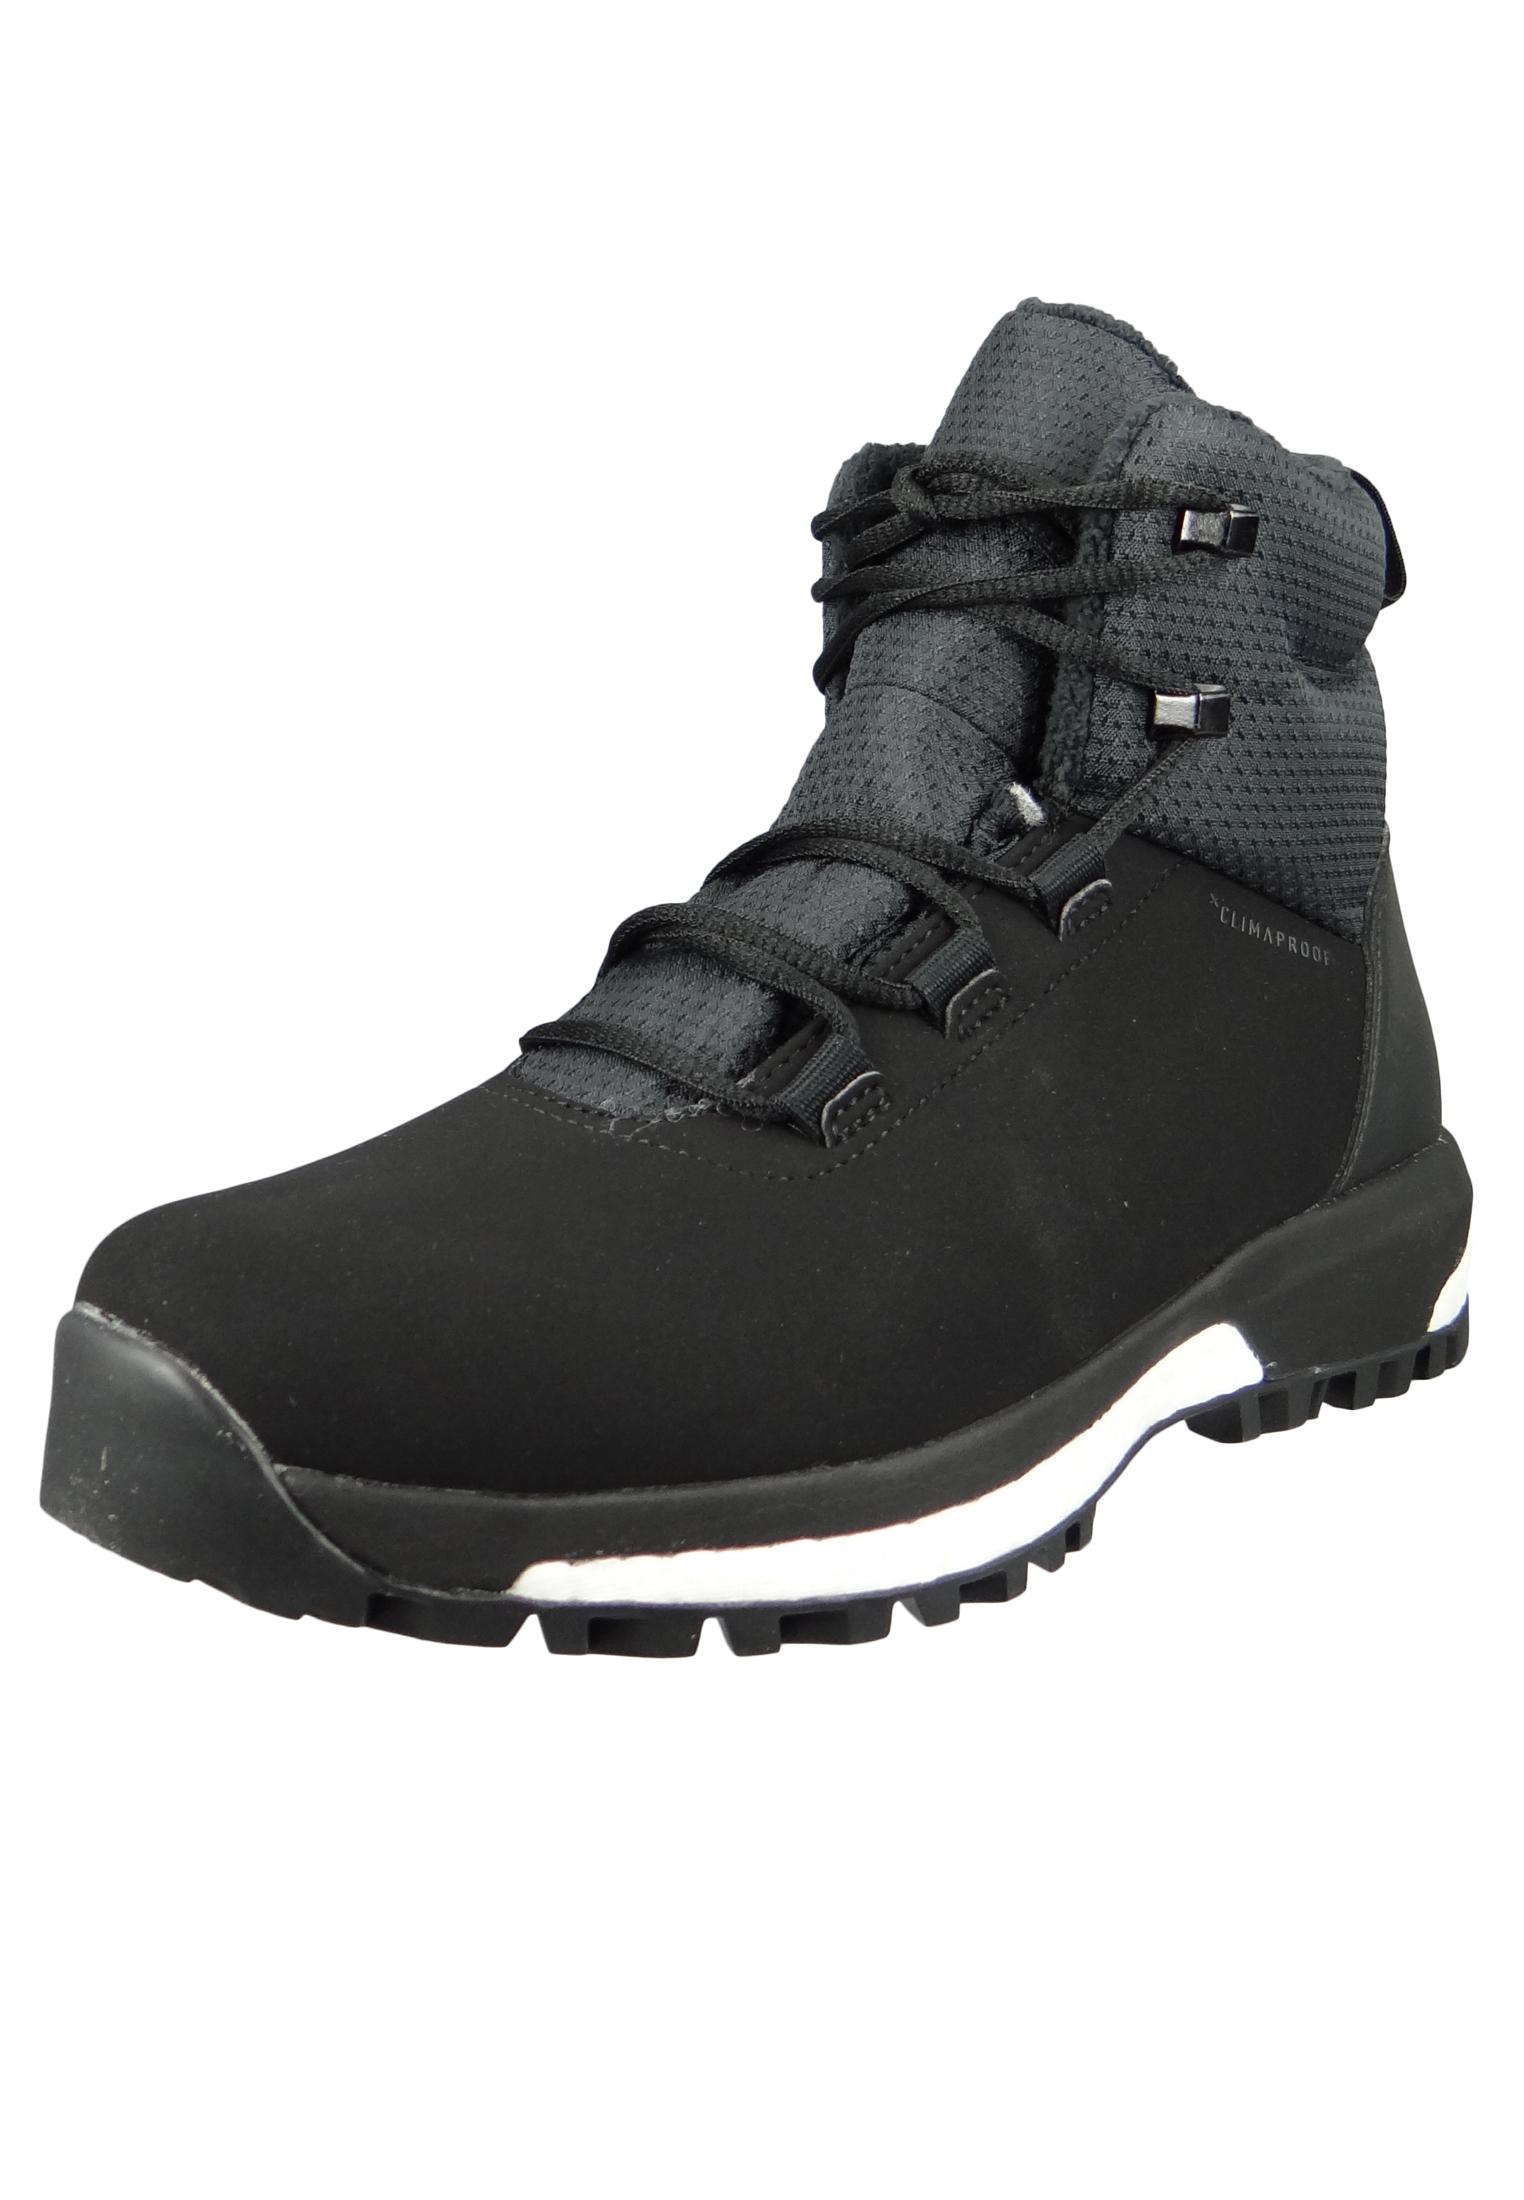 adidas TERREX Pathmaker CP CW W AC7844 Damen Winterstiefel Boots Core Black Schwarz